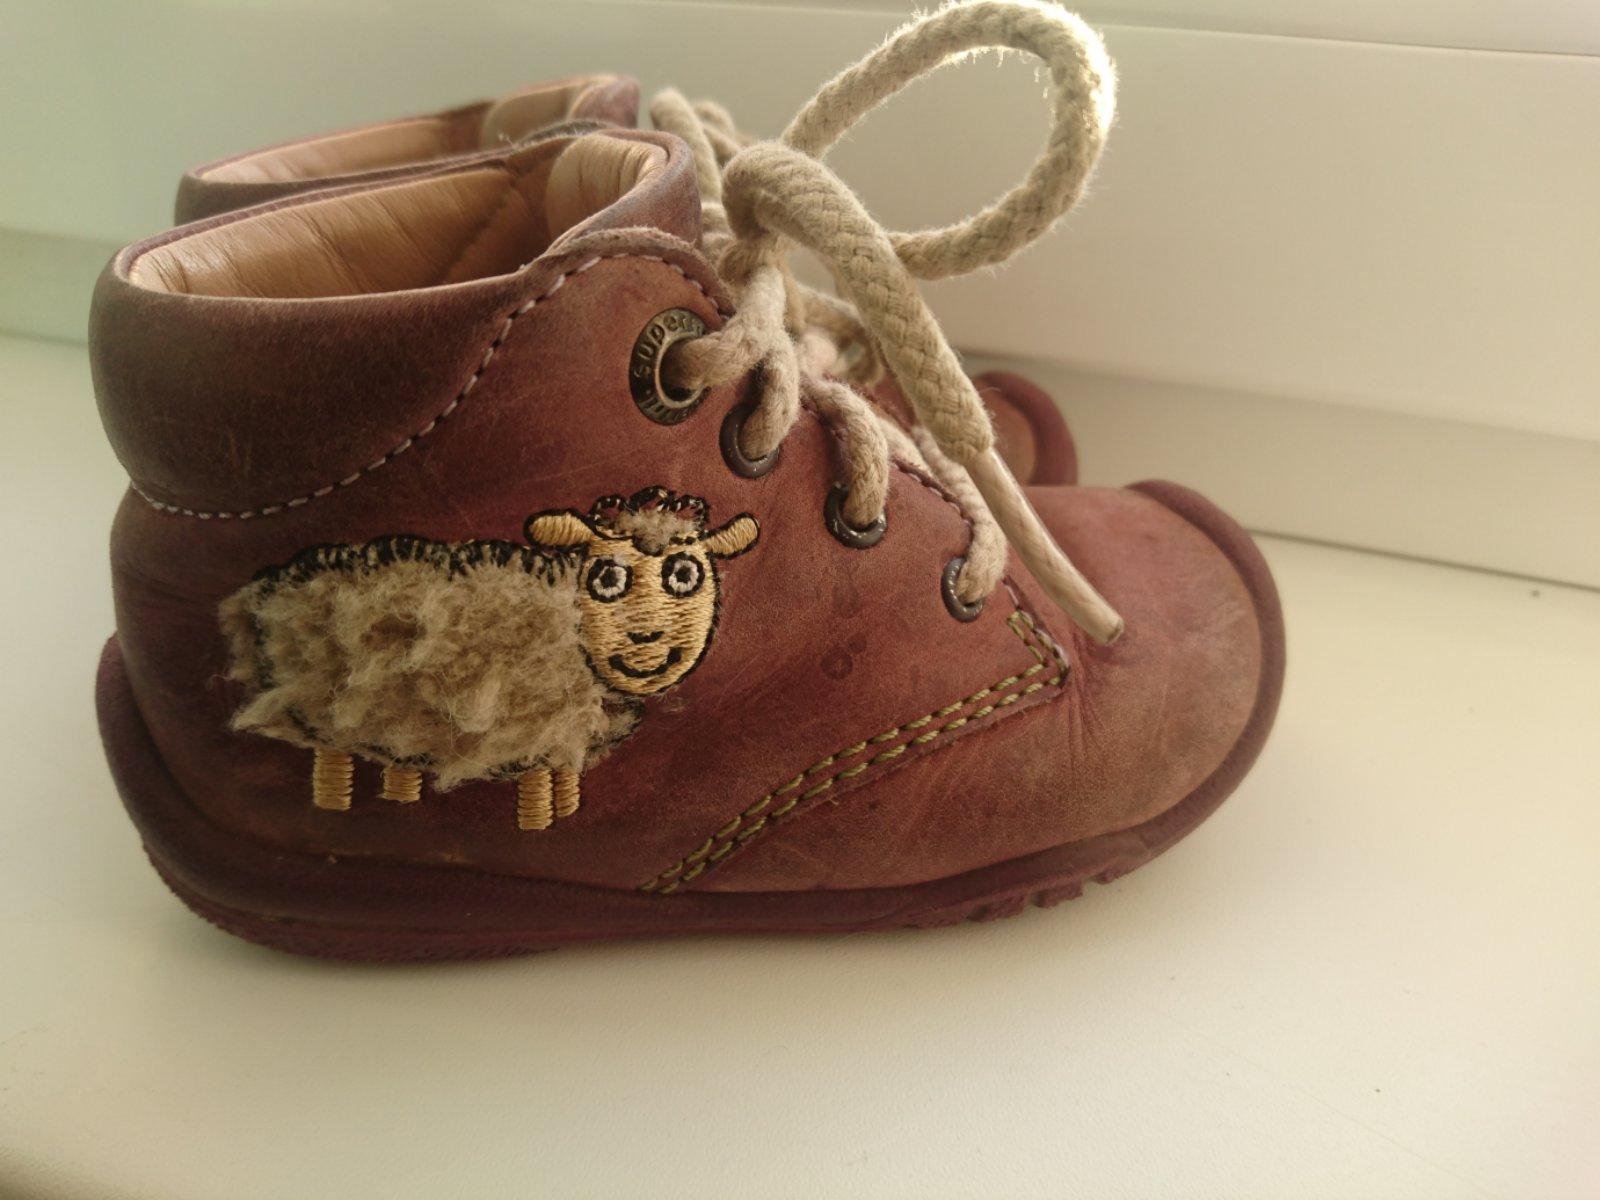 966f513ffcdb Značkové topánky